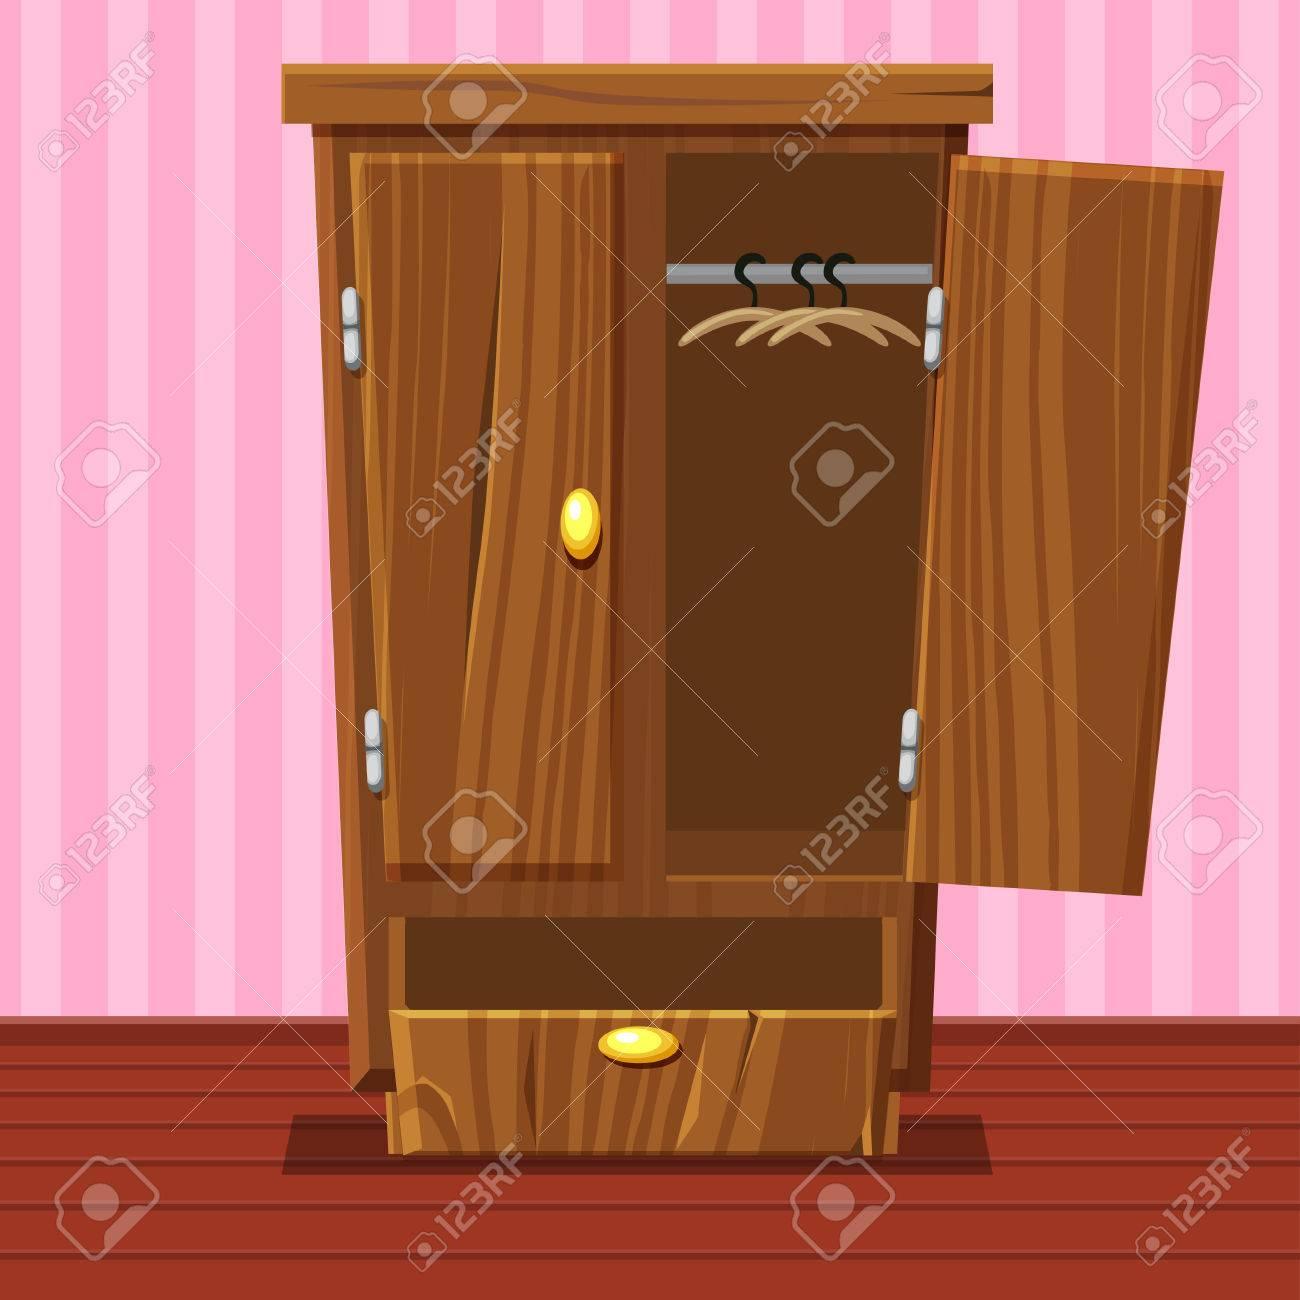 Cartoon Empty Open Wardrobe Living Room Wooden Furniture In  # Muebles Wardrobe